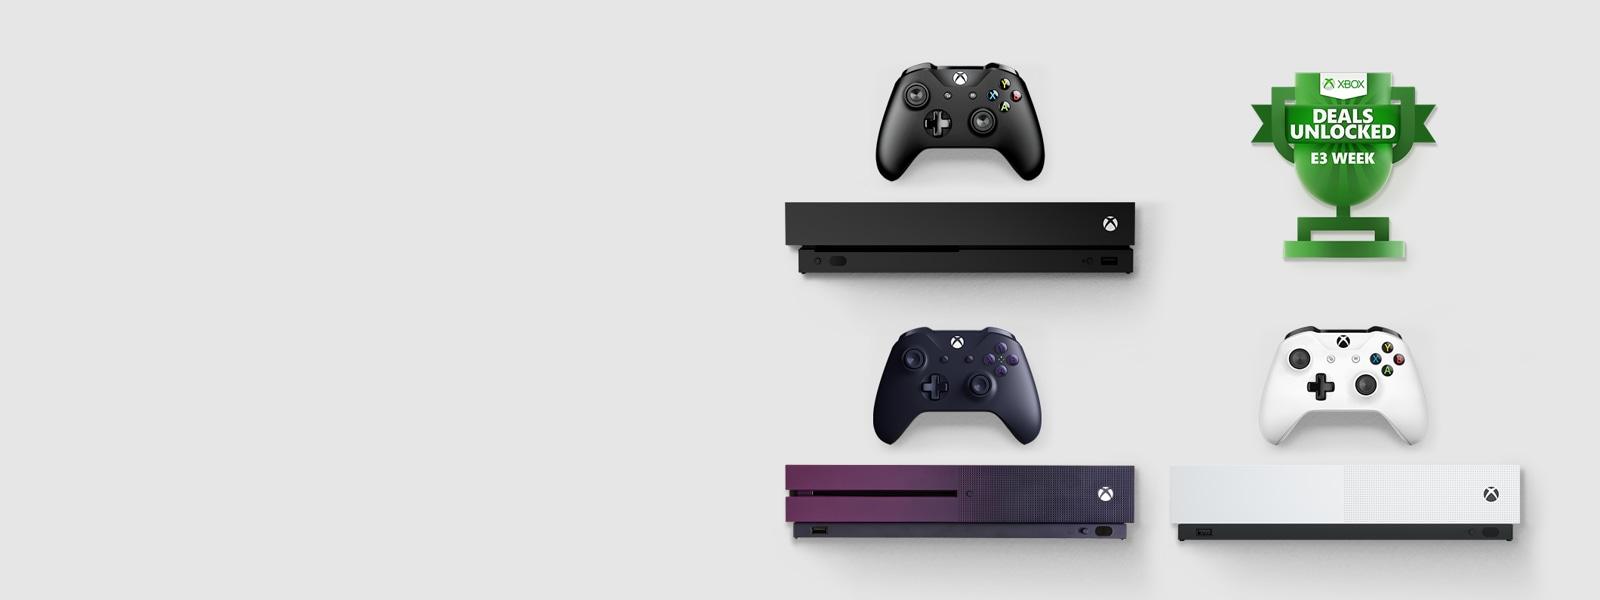 E3, Xbox One Konsolen mit Controller